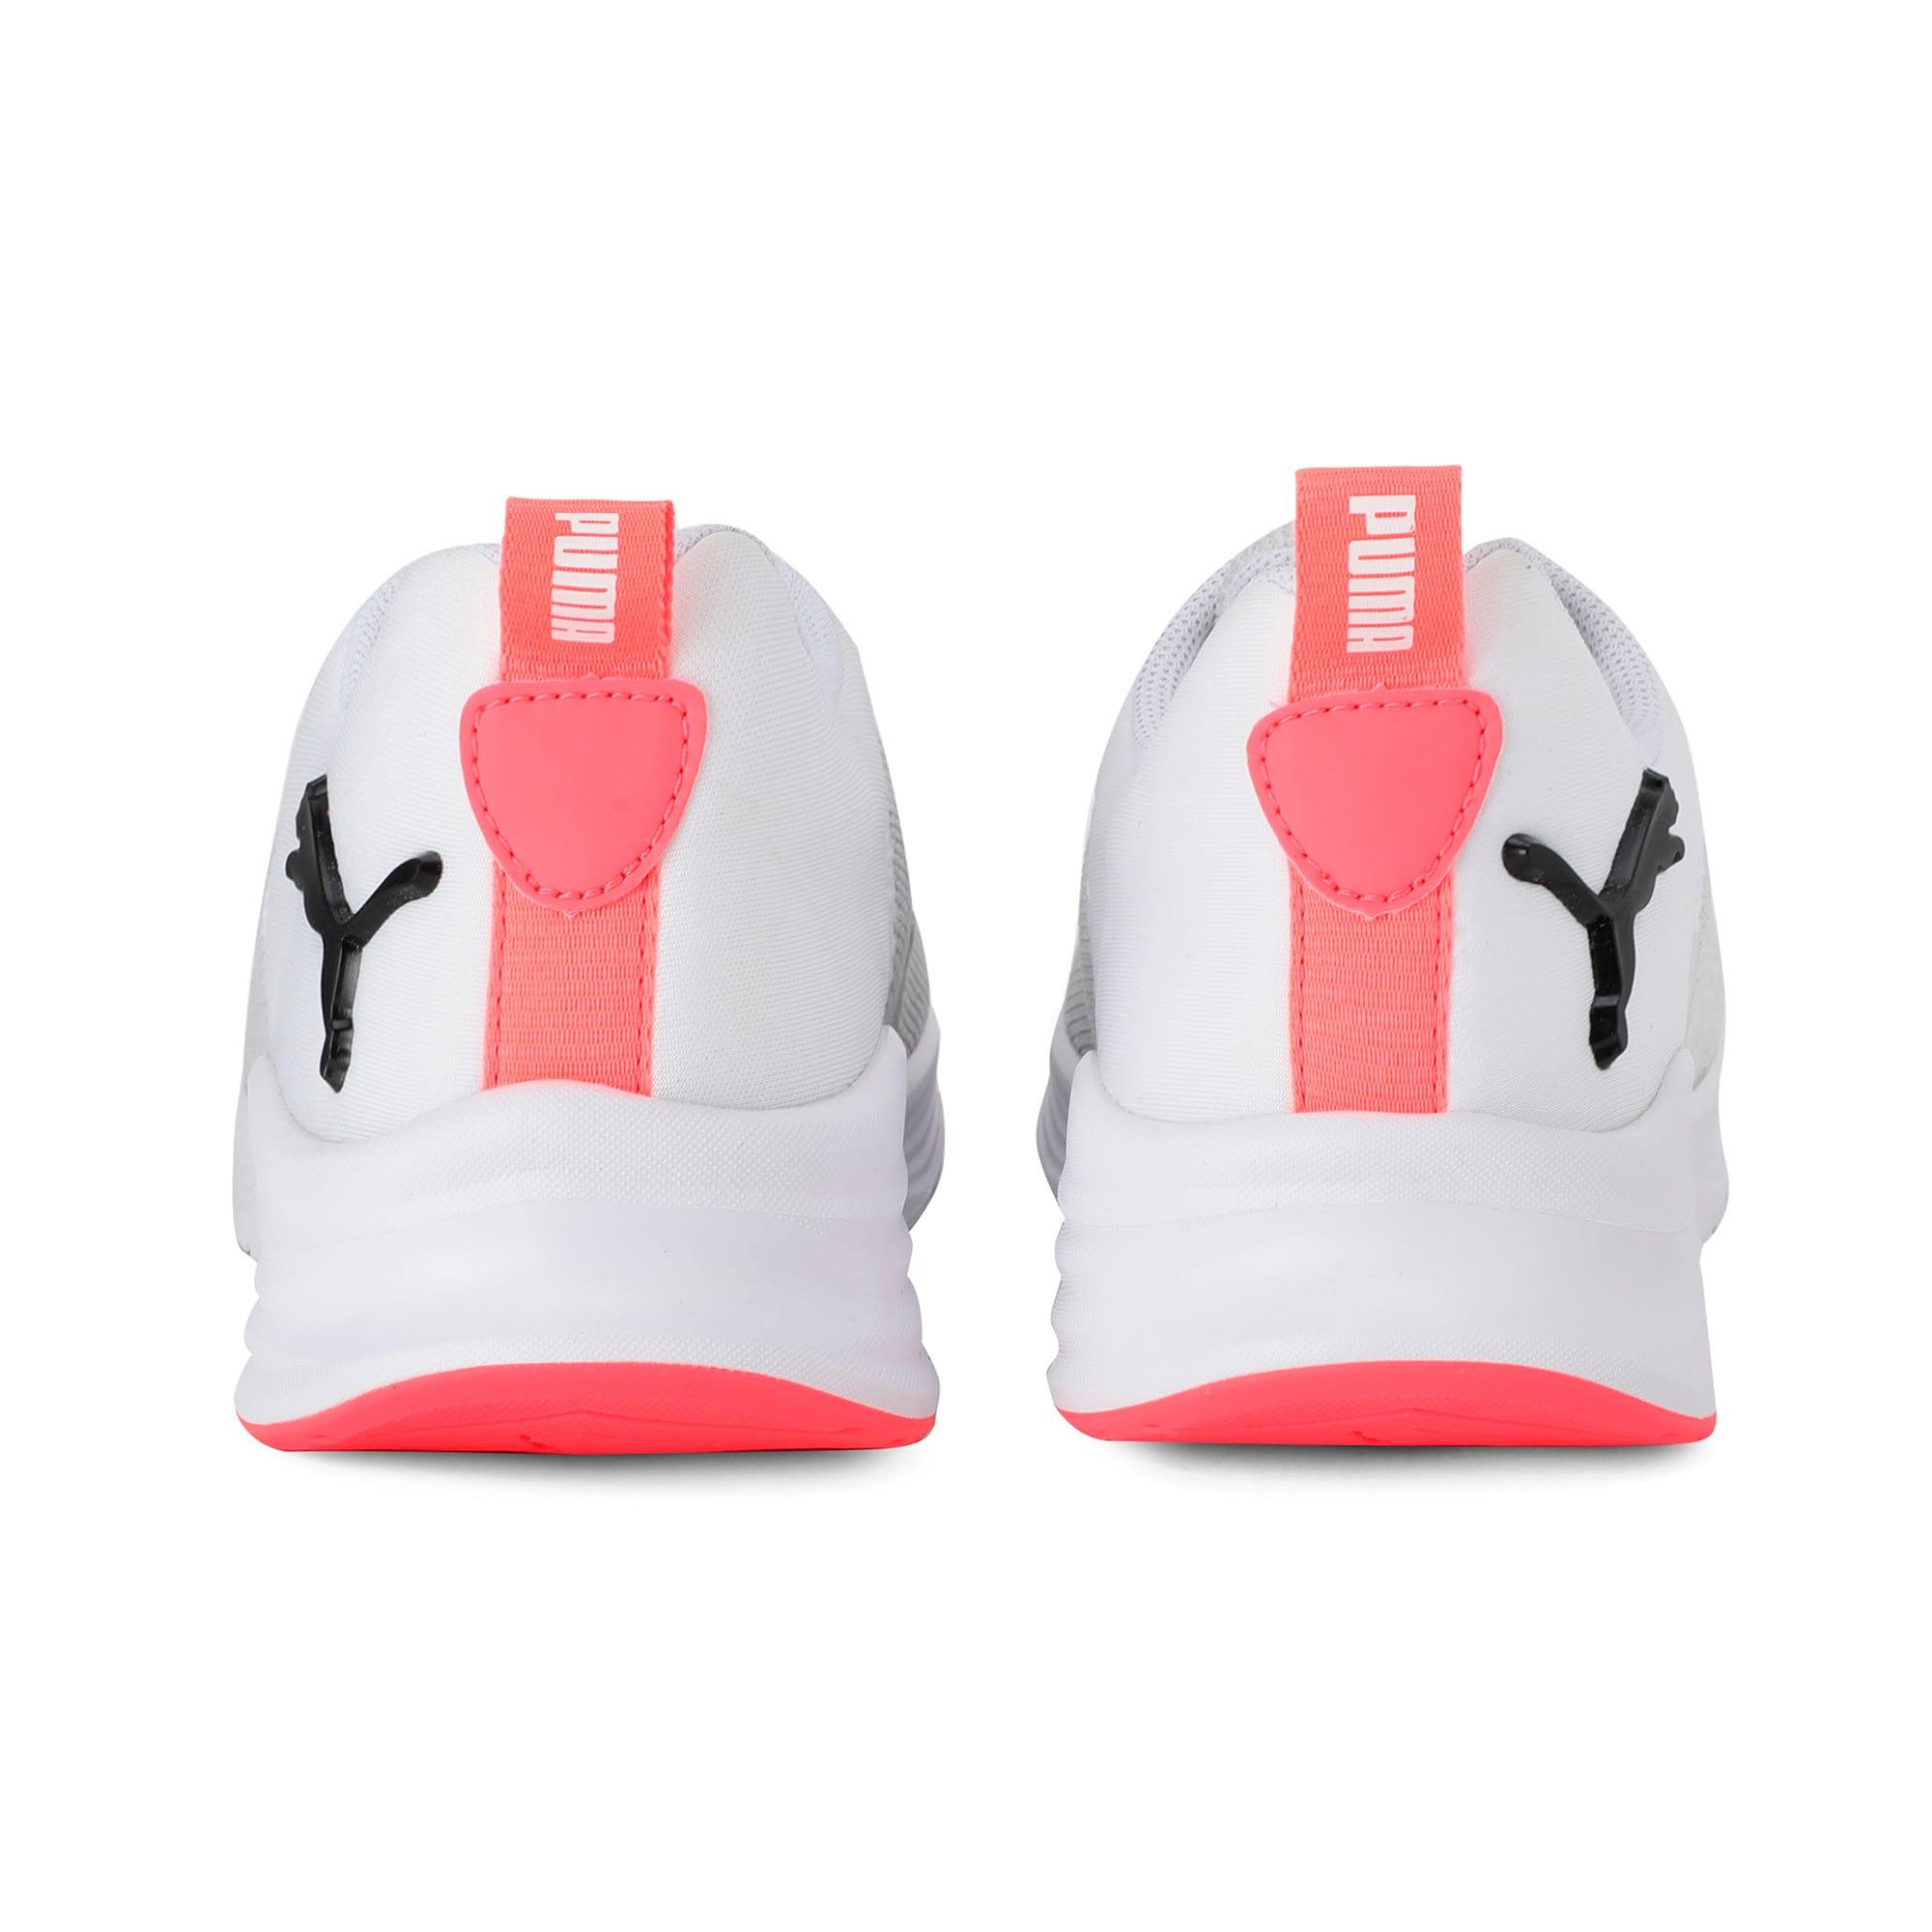 Thumbnail 3 of HYBRID Fuego Knit Women's Running Shoes, Puma White-Pnk Alert-Pma Blk, medium-IND